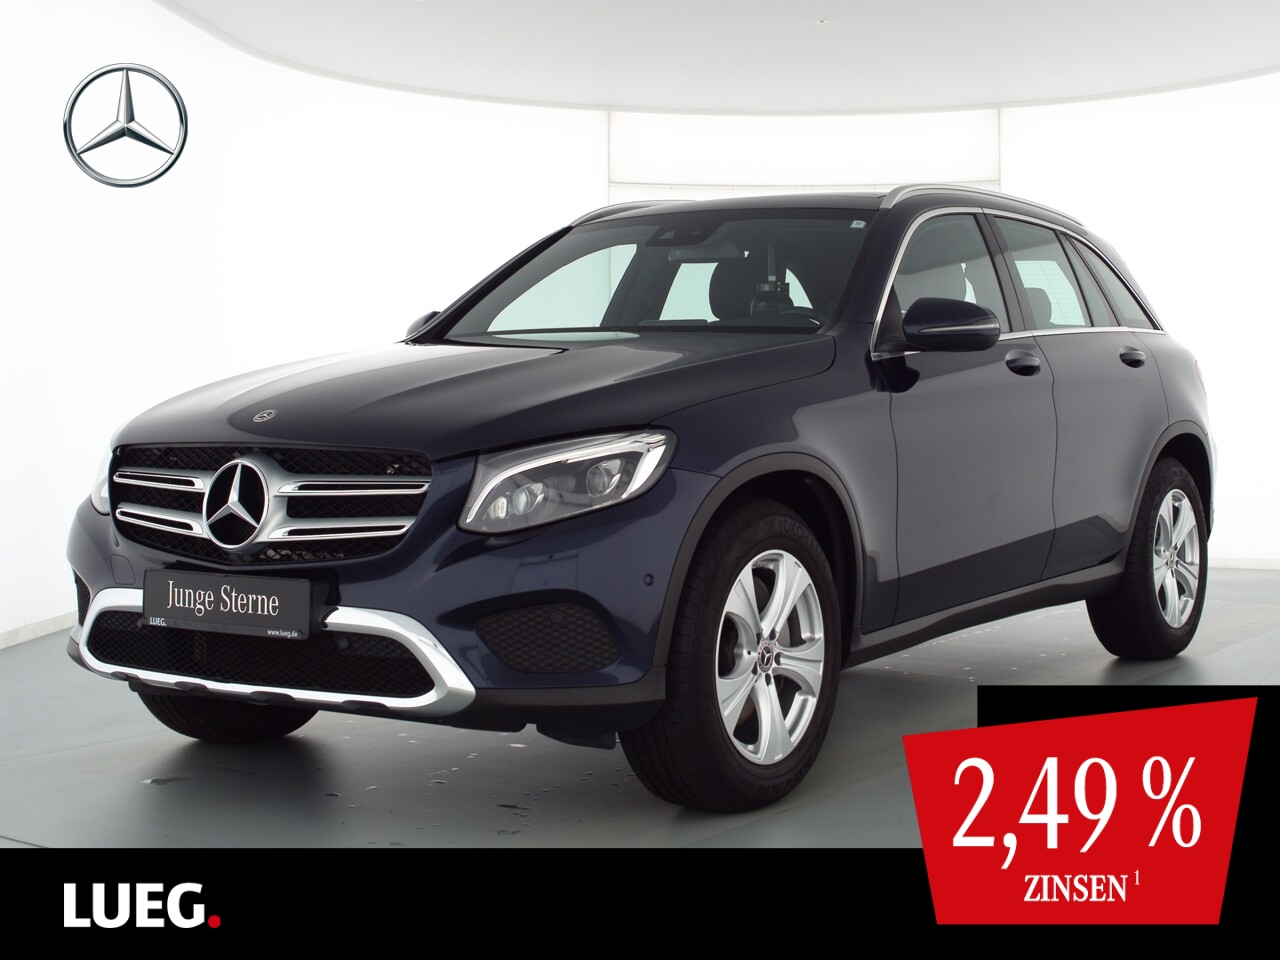 Mercedes-Benz GLC 250 4M COM+Pano+Burm+LED-ILS+Sthzg+SpurP+RFK, Jahr 2019, Benzin